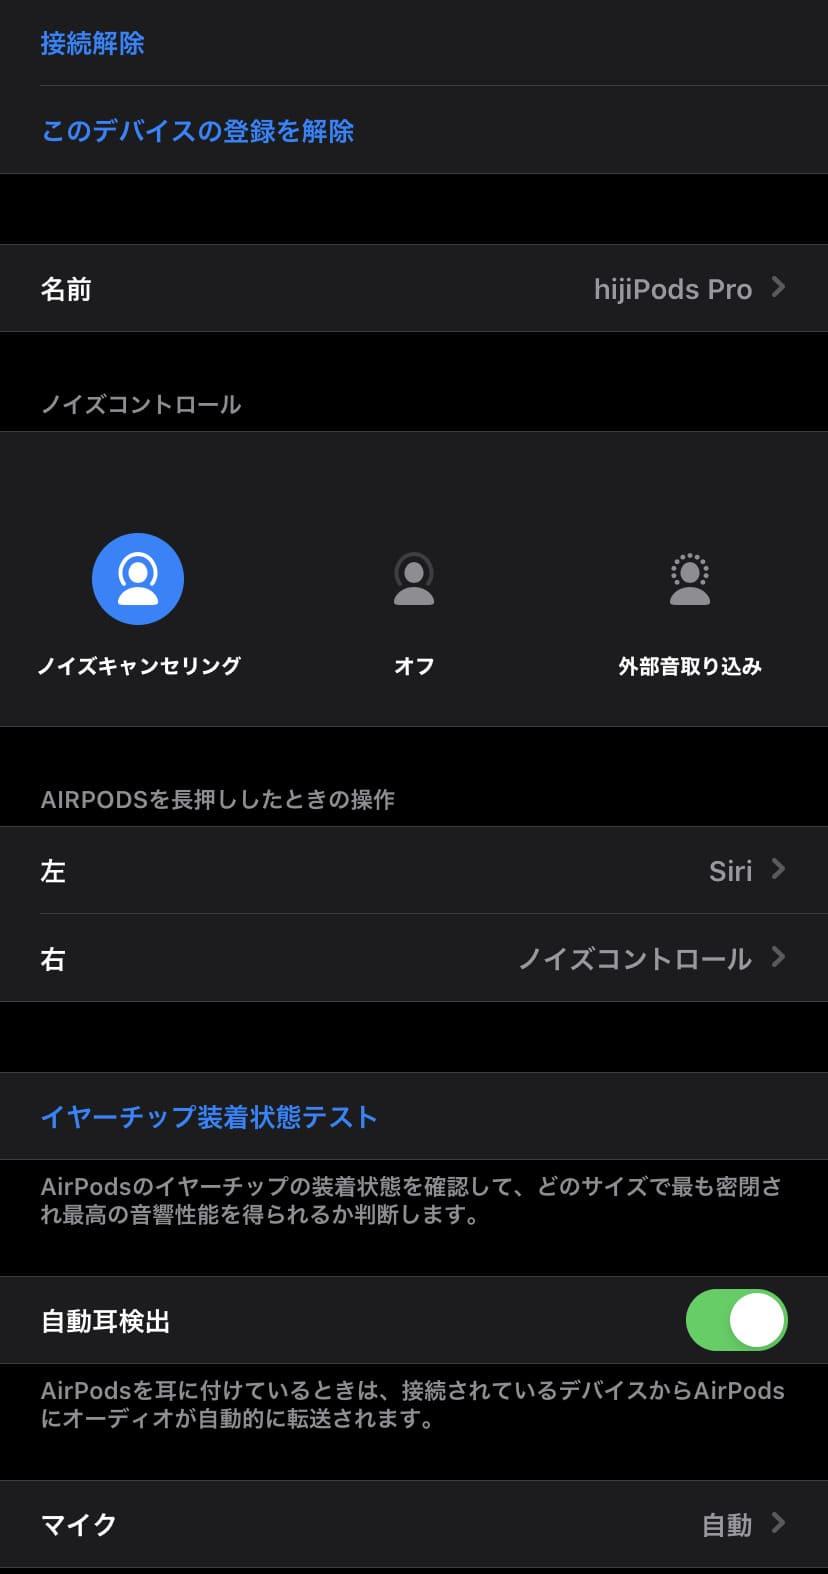 AirPods Proのカスタマイズ